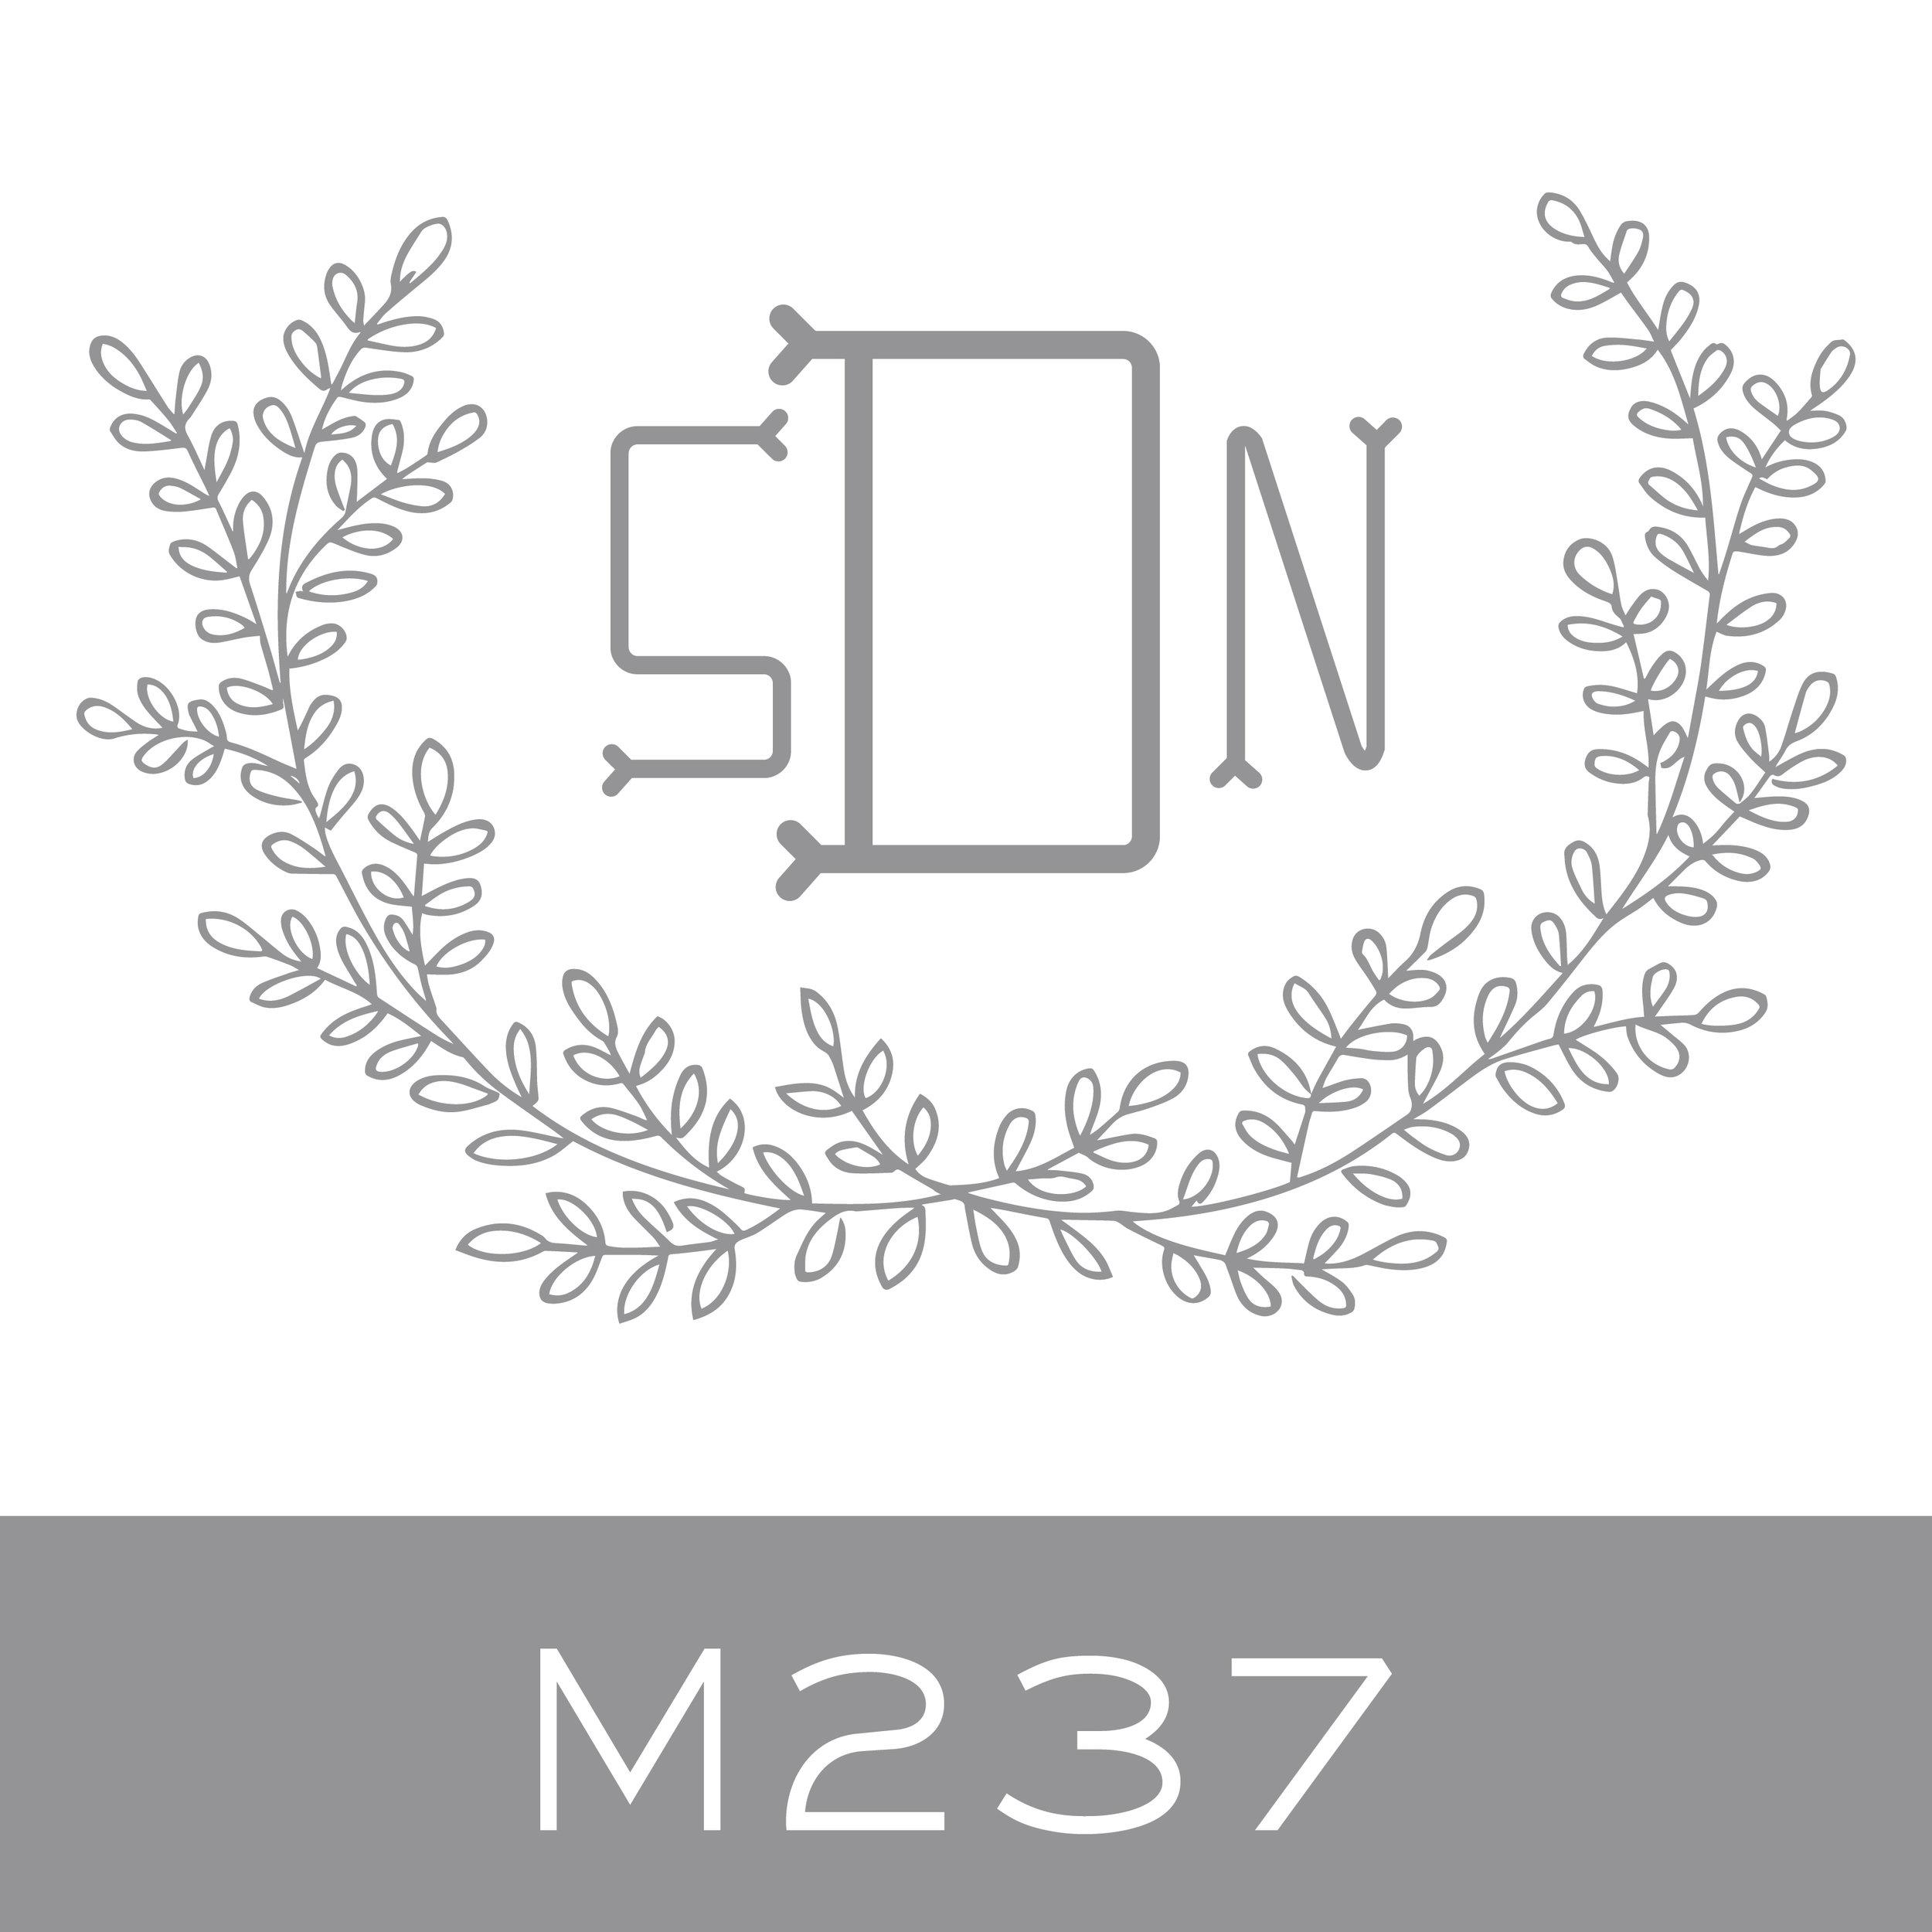 M237.jpg